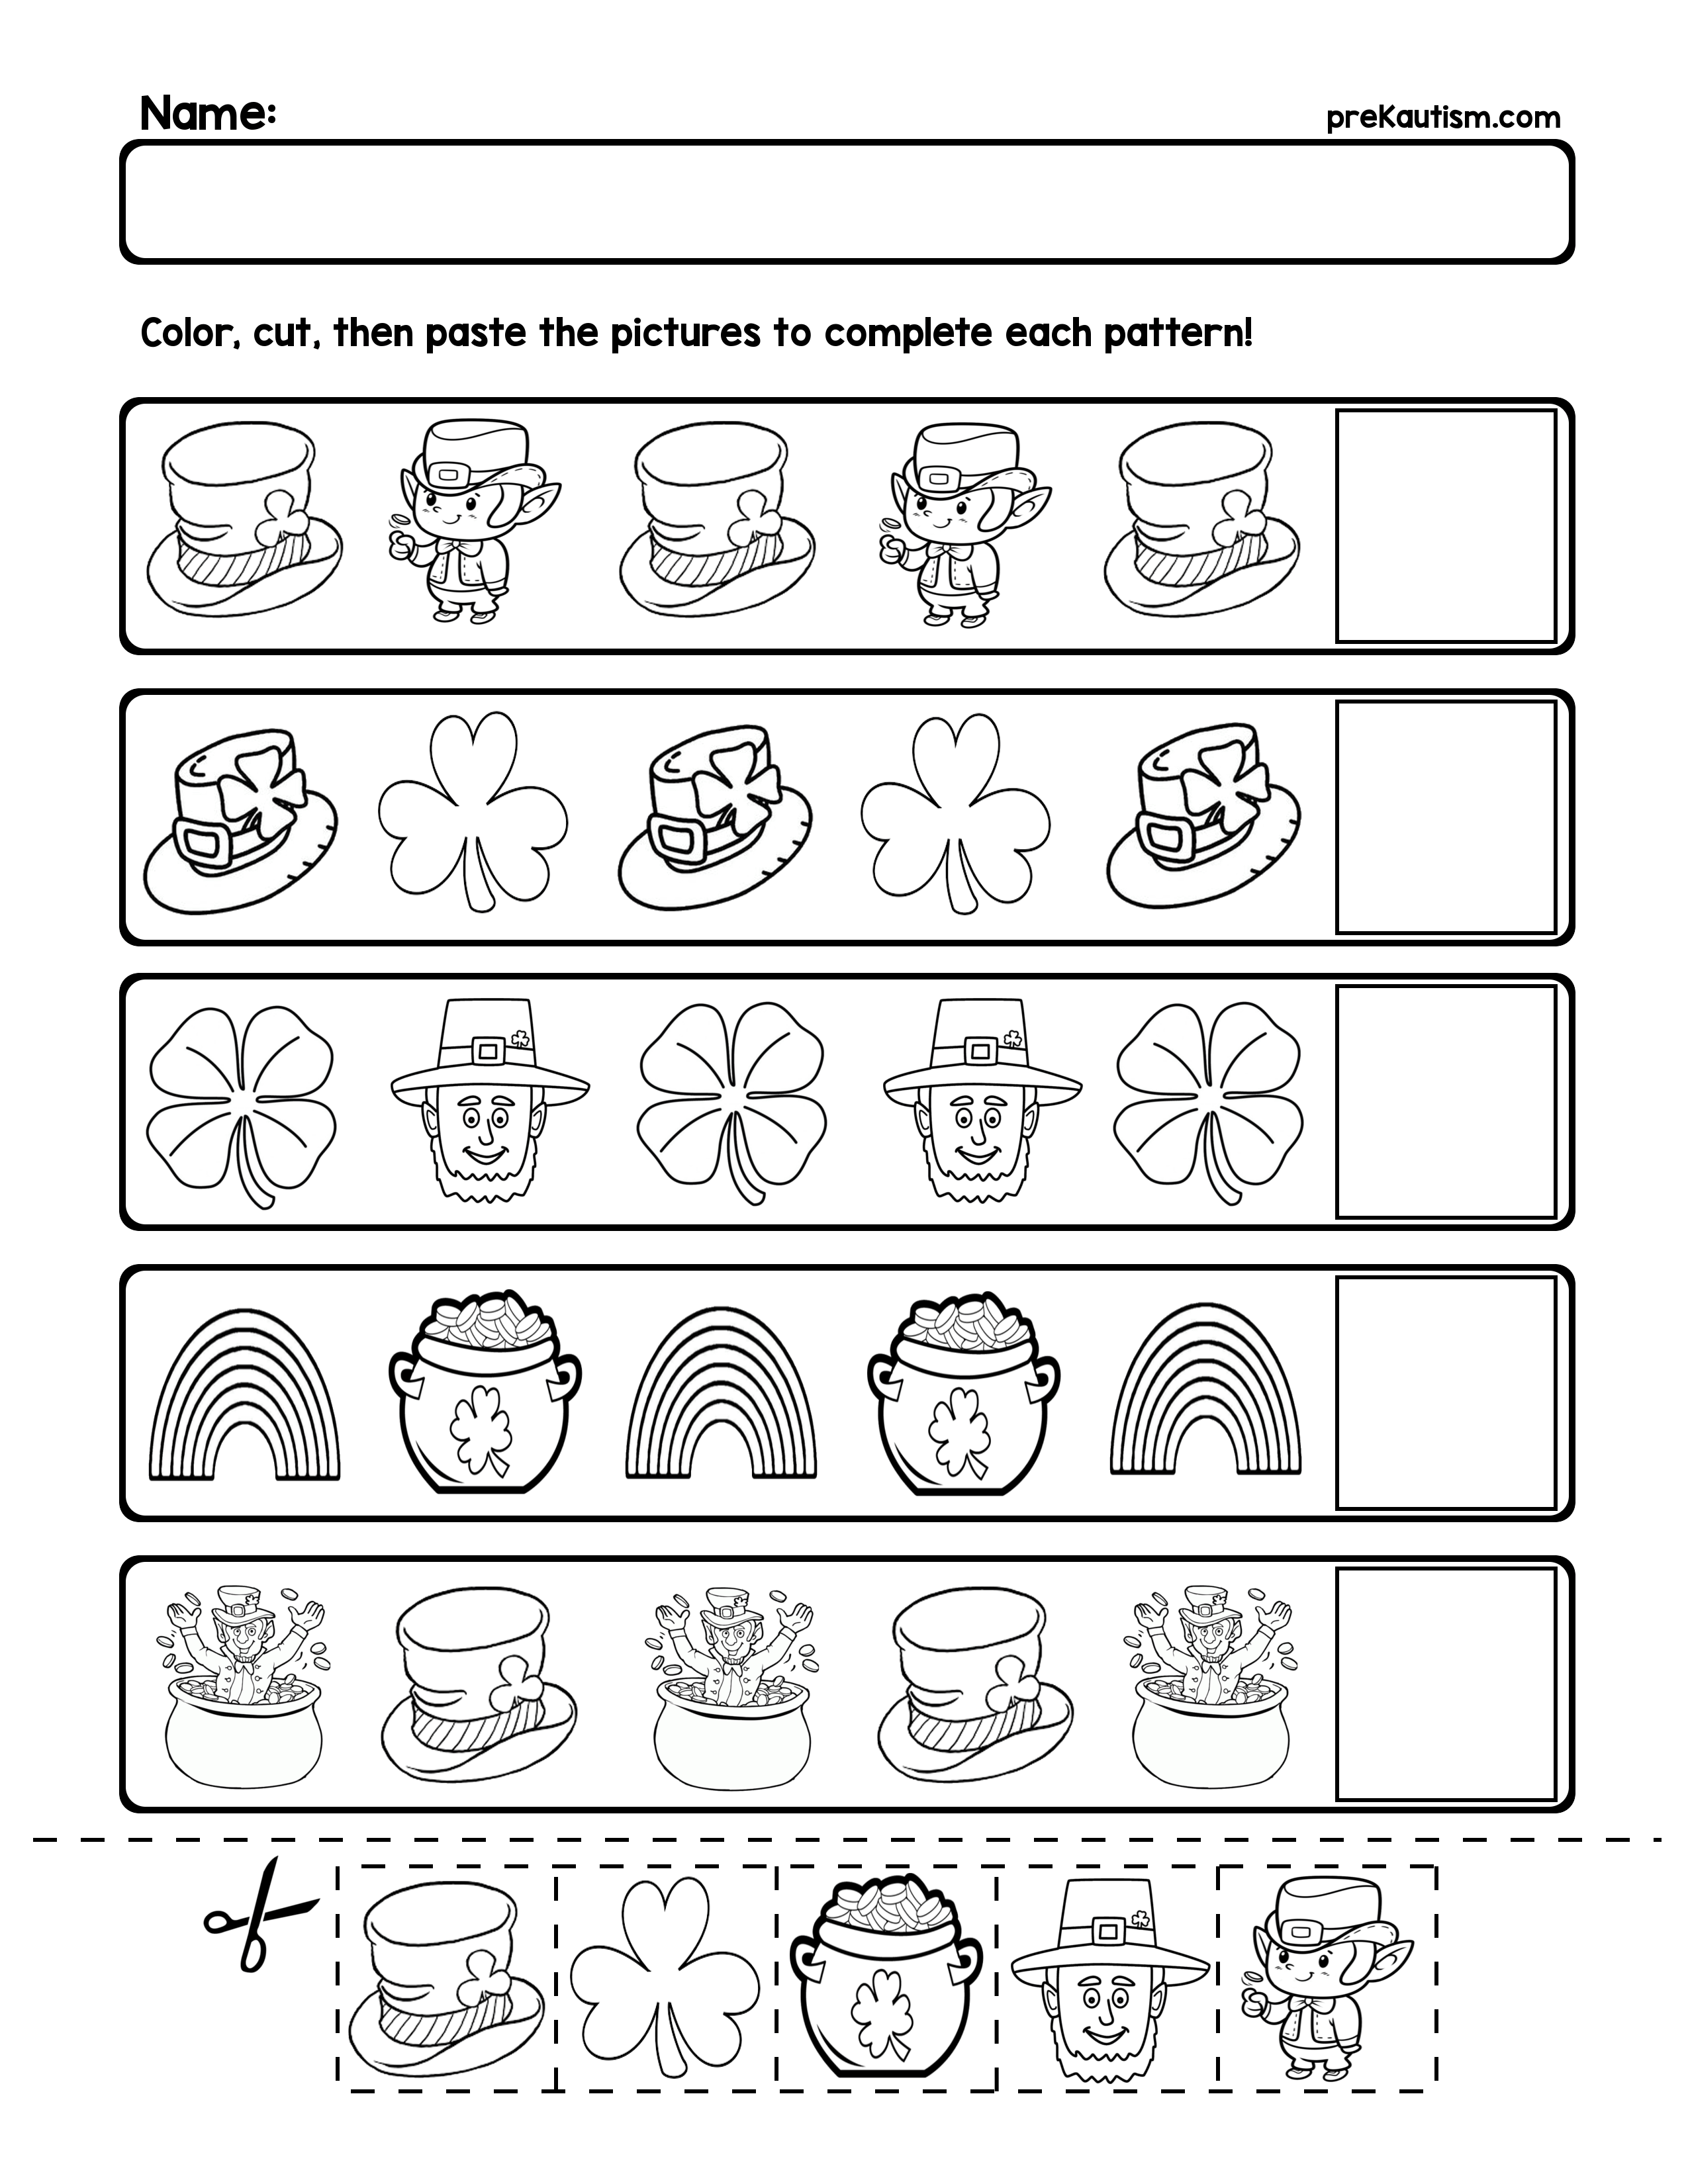 Free St. Patrick's Day Pattern Worksheets | Ab Patterns